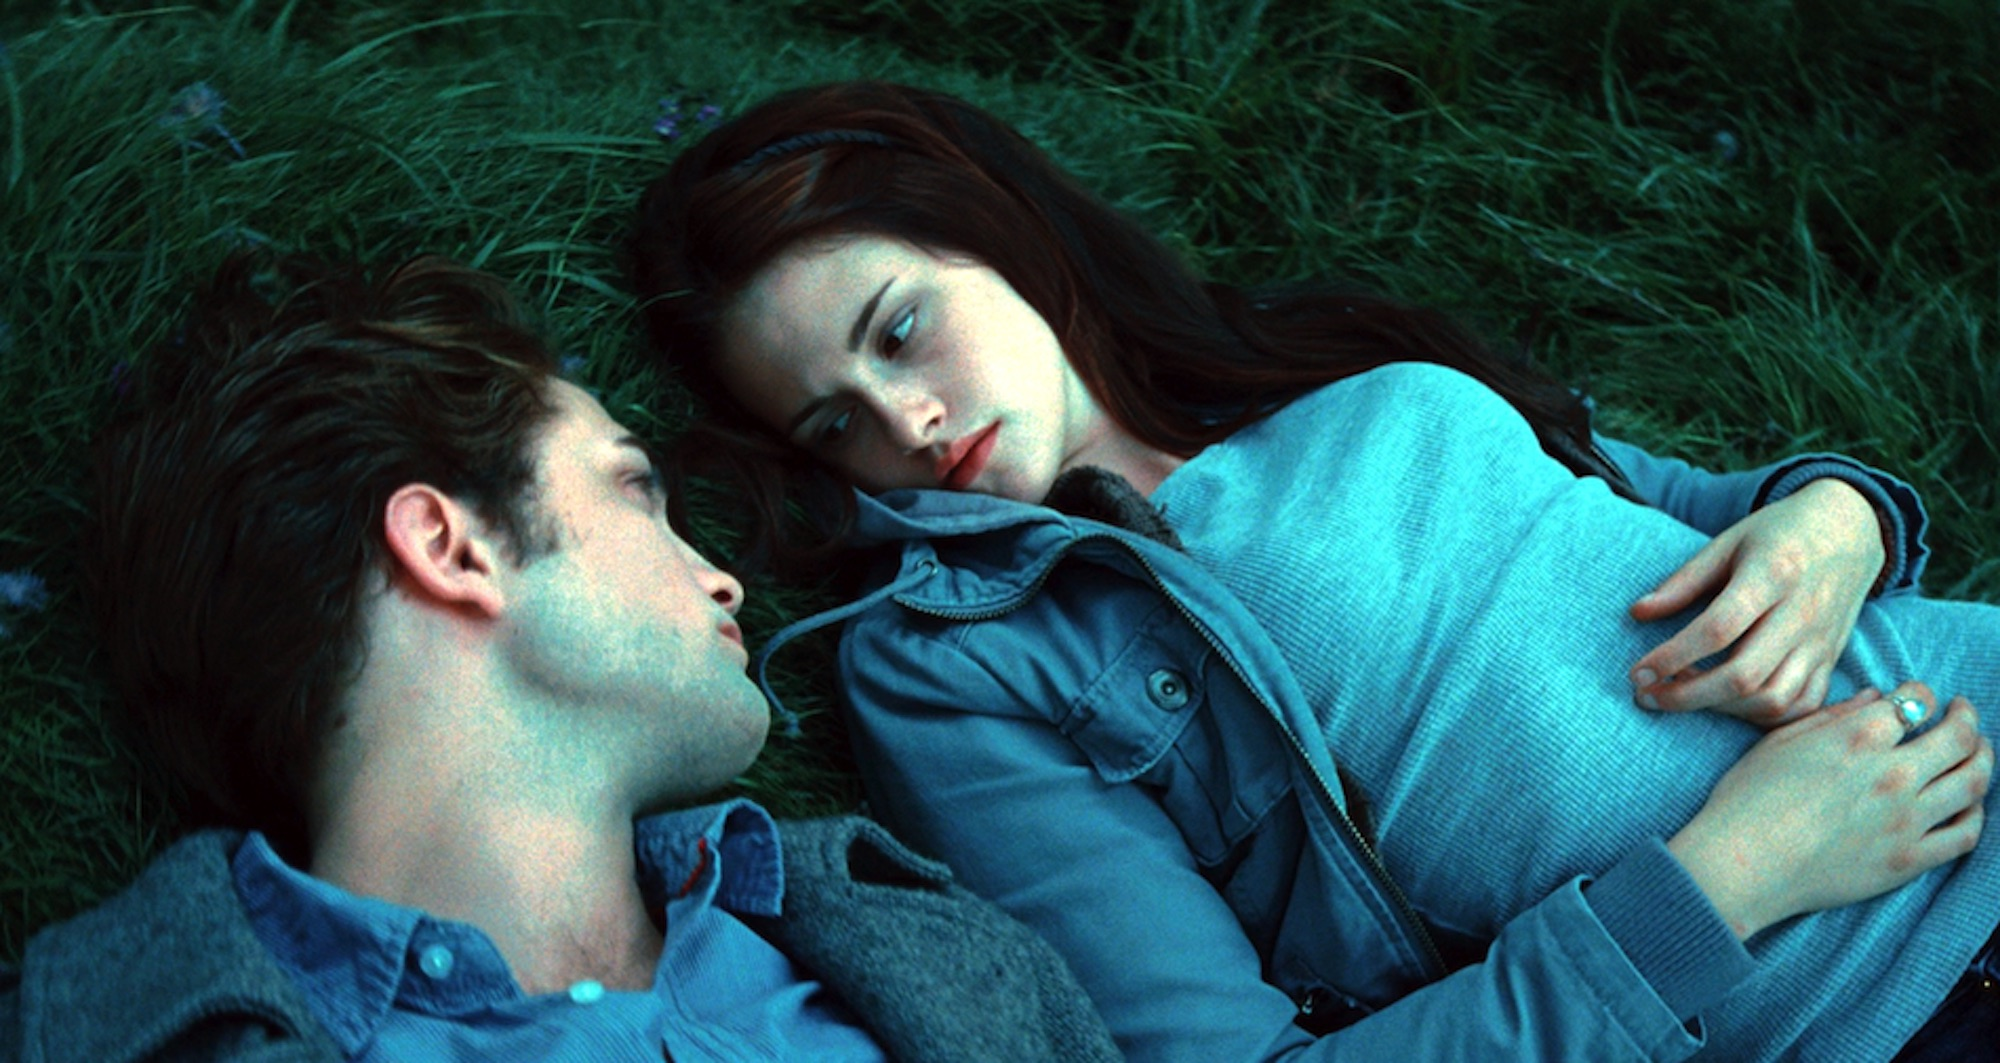 Edward Cullen (Robert Pattinson) and Bella Swan (Kristen Stewart) in his meadow in 'Twilight'